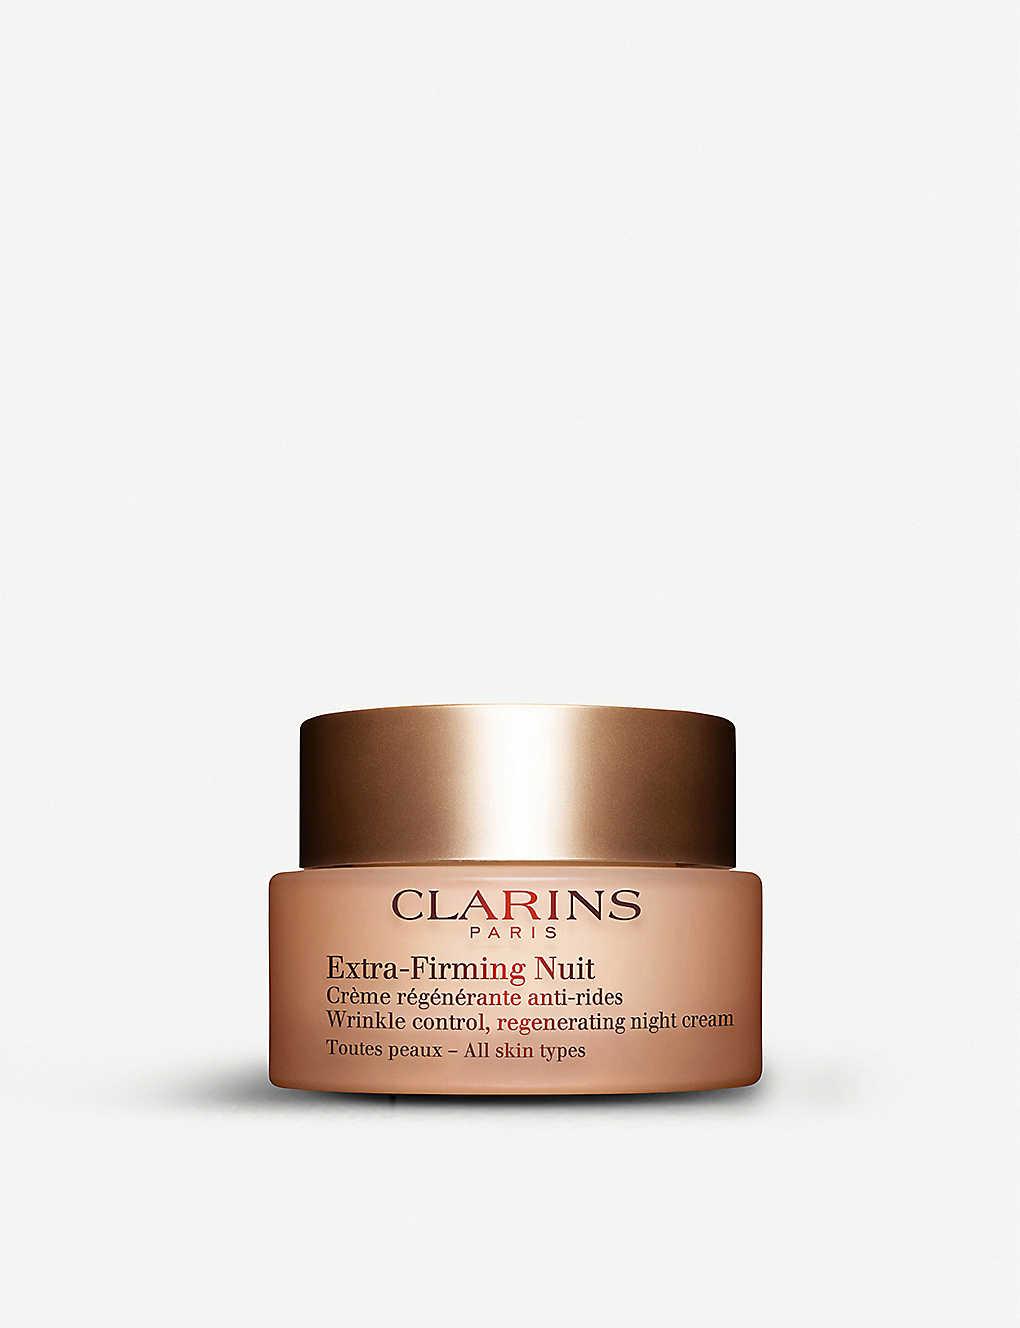 CLARINS: Extra-Firming Night Cream